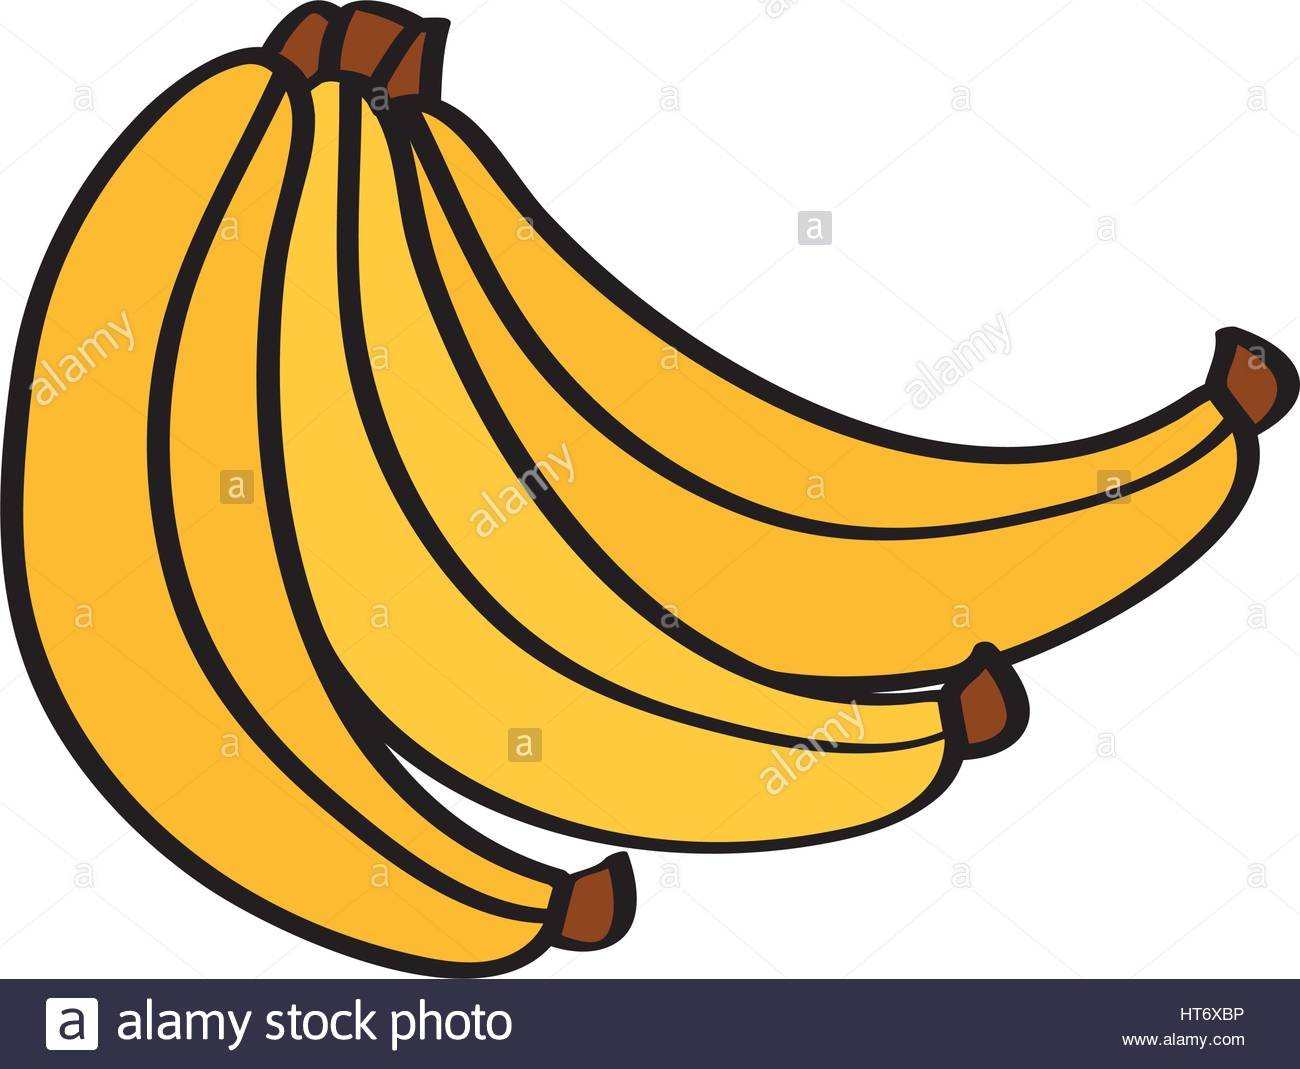 1300x1069 Banana Fresh Fruit Drawing Icon Stock Vector Art Amp Illustration